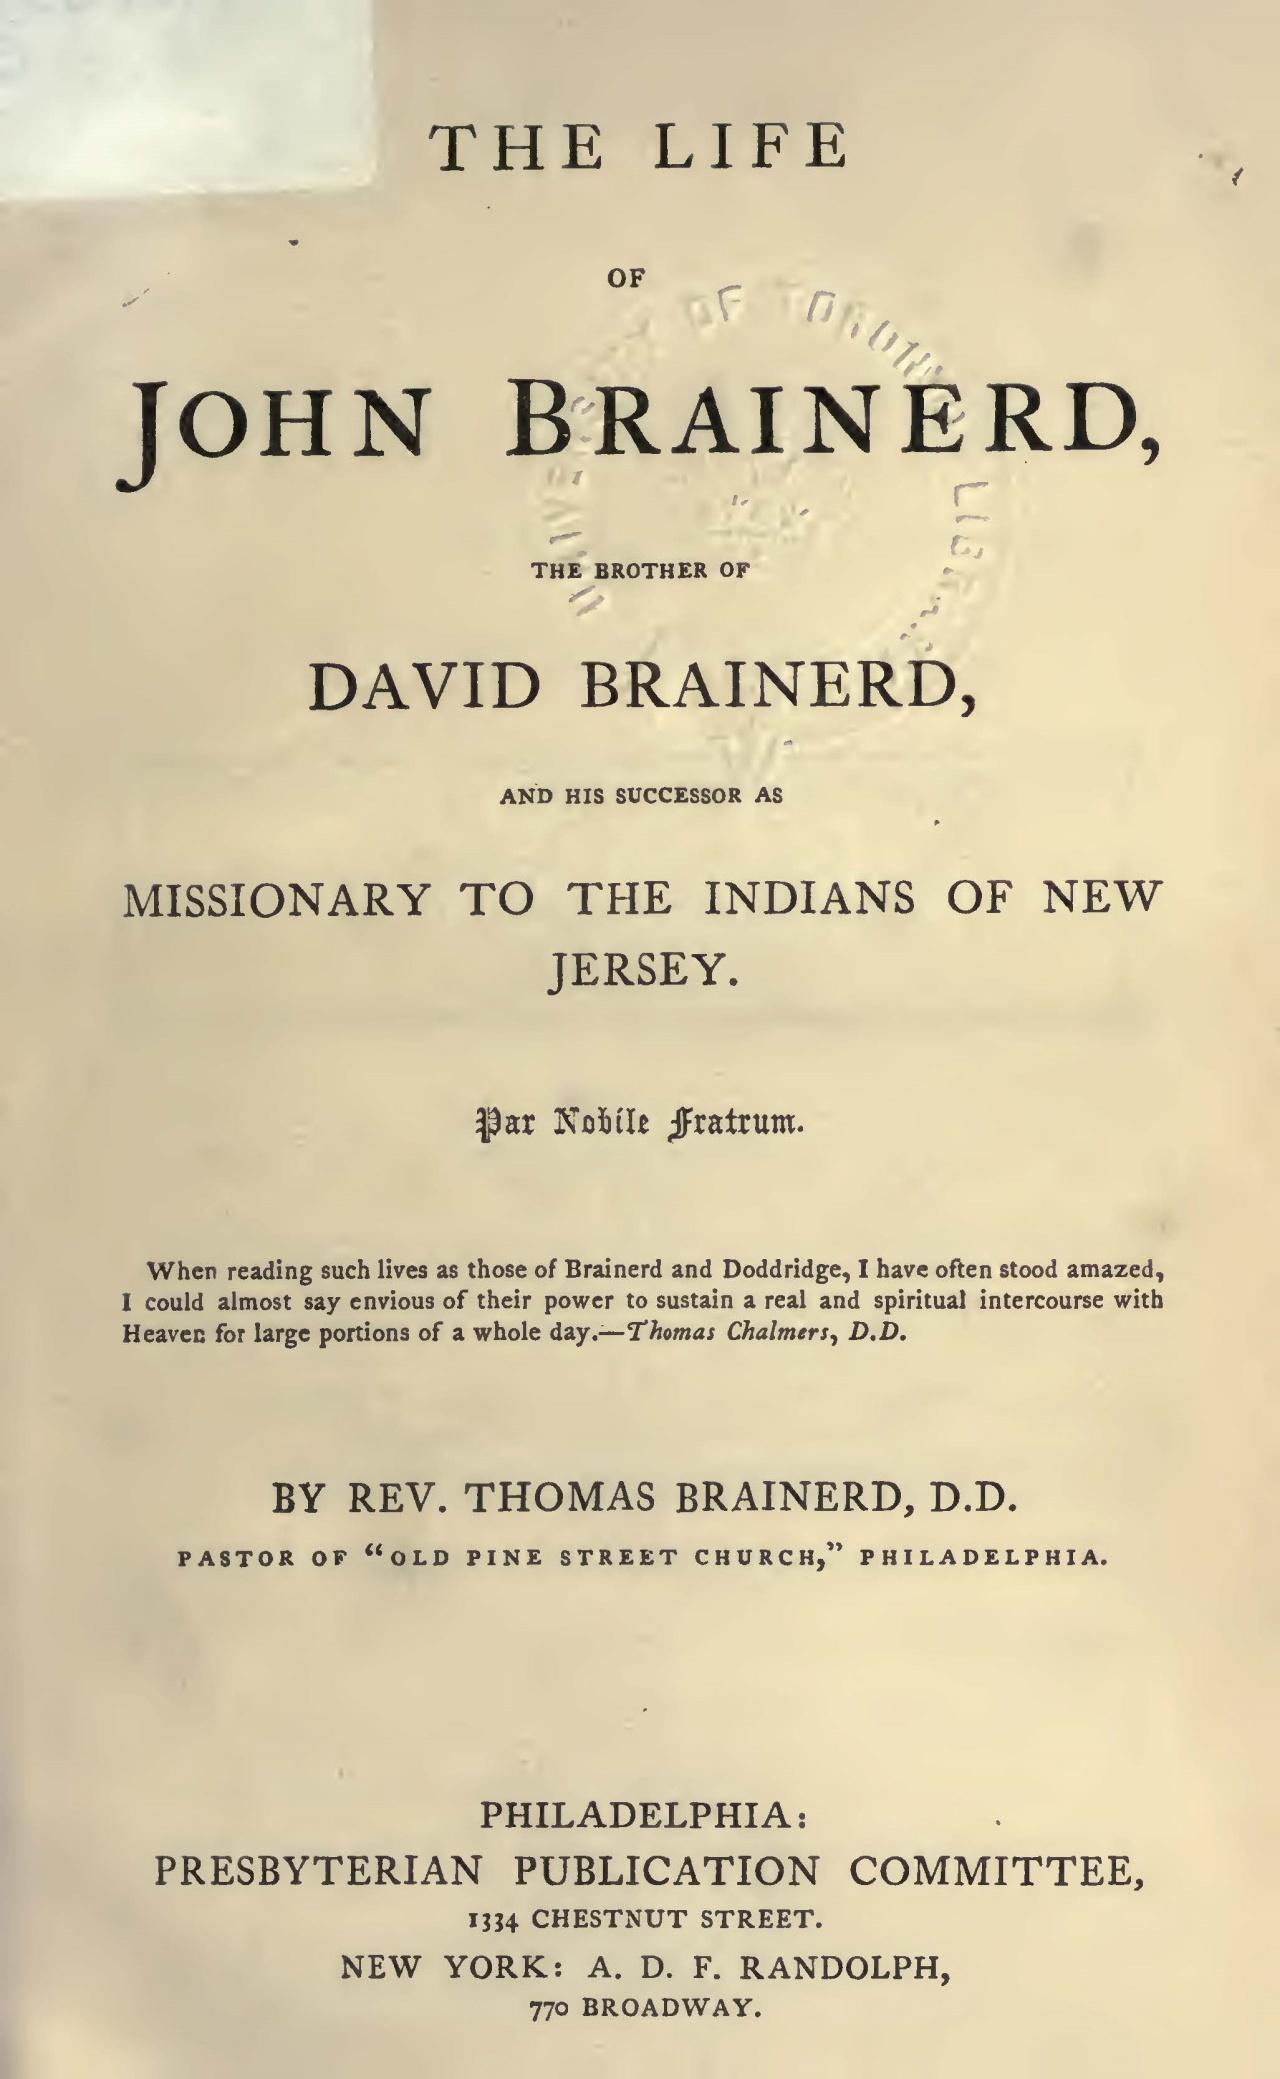 Brainerd, Thomas, The Life of John Brainerd Title Page.jpg